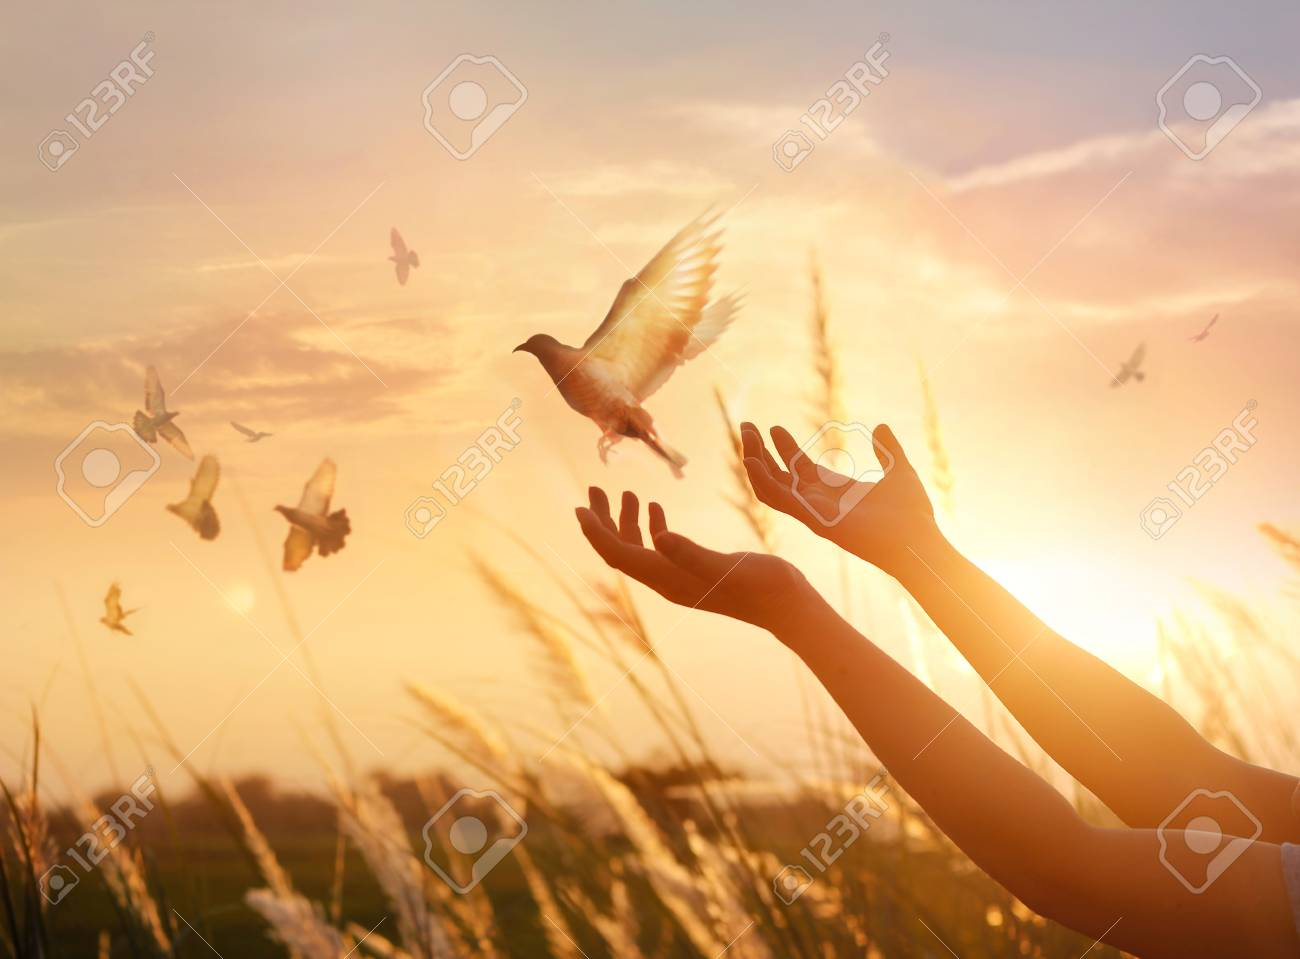 Woman praying and free bird enjoying nature on sunset background, hope concept - 97229054